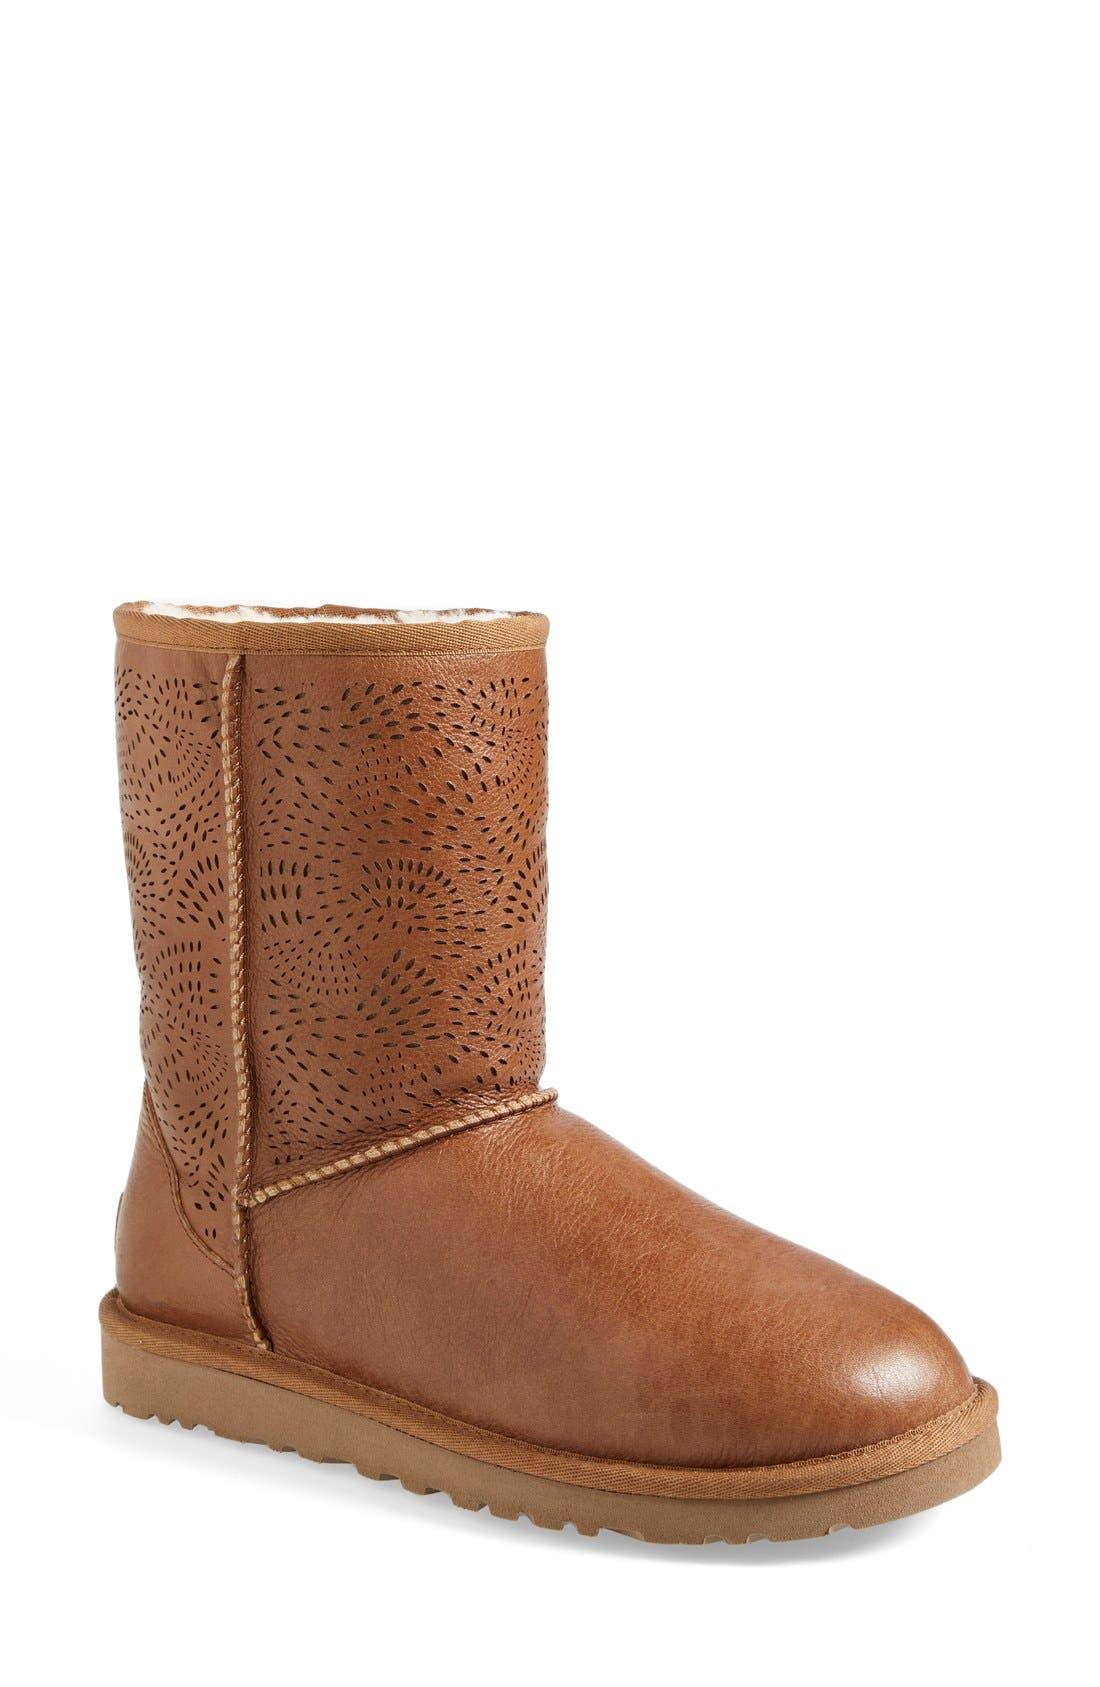 Alternate Image 1 Selected - UGG® Australia 'Triana' Perforated Boot (Women)